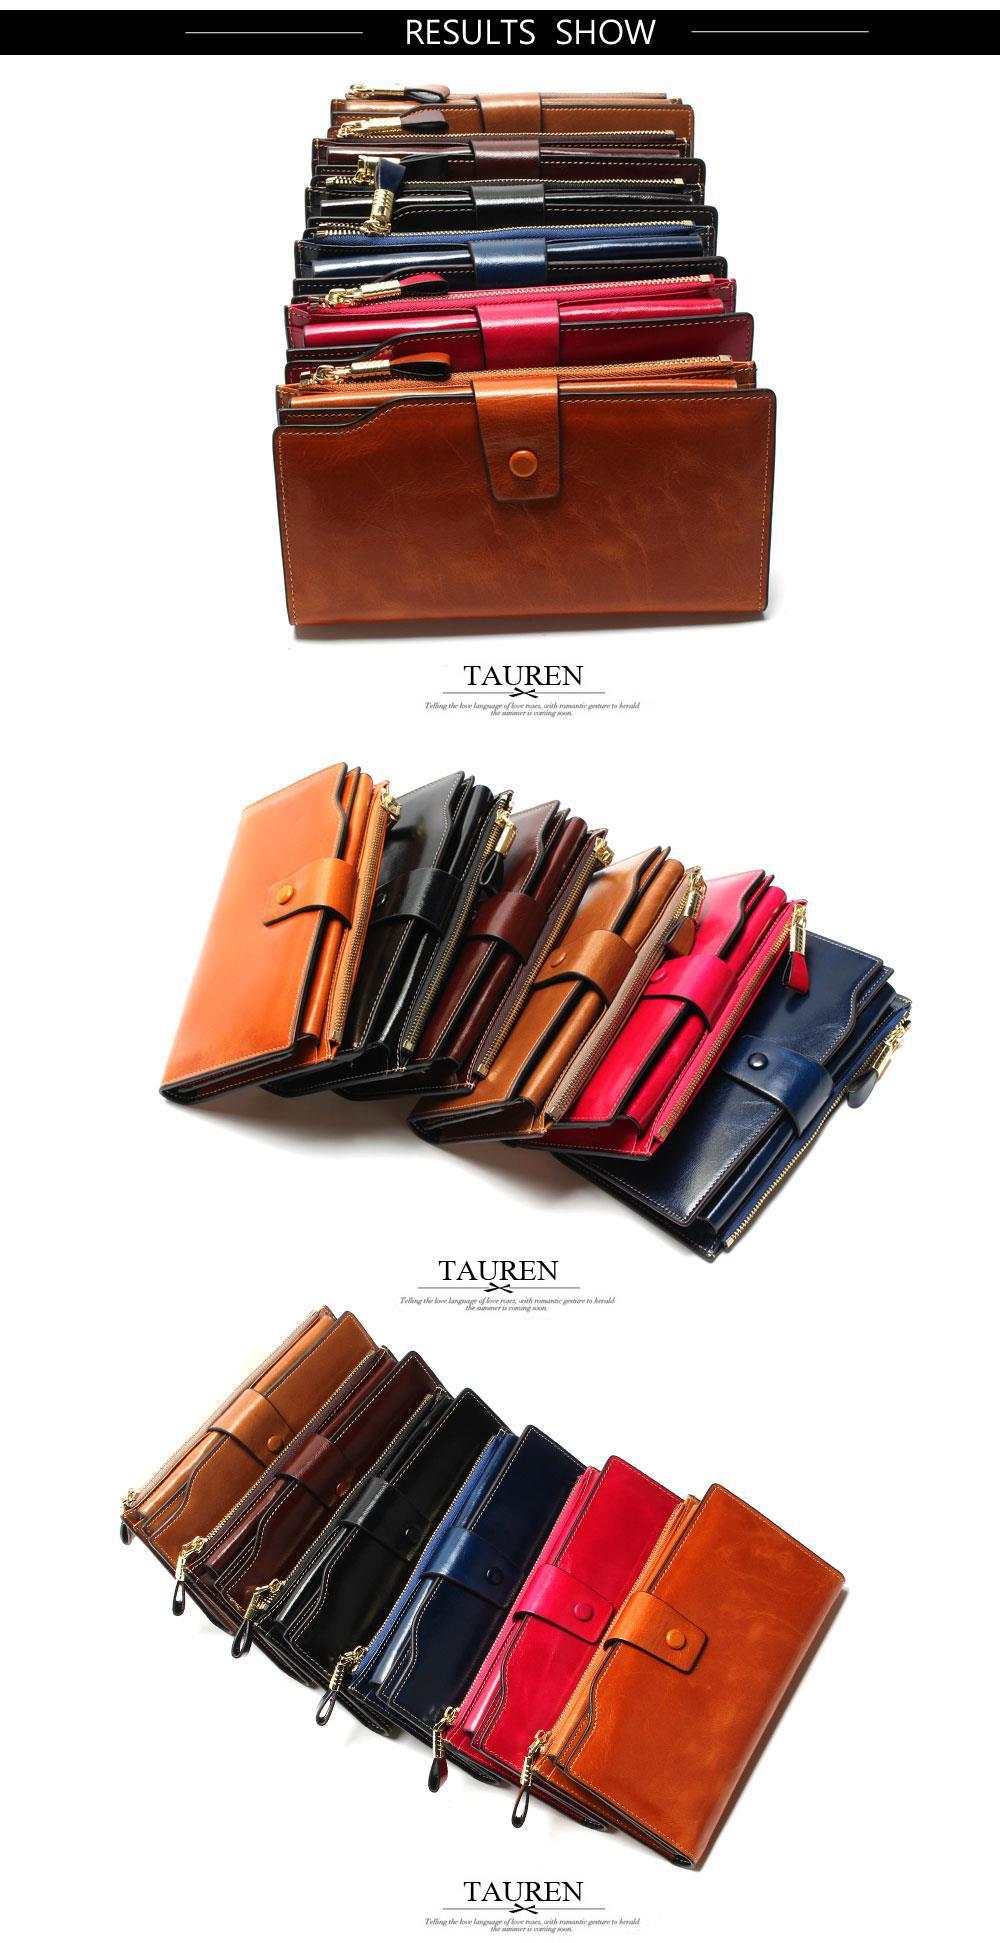 HTB1egQXOVXXXXa2XpXXq6xXFXXXx - 2018 New Design Fashion Multifunctional Purse Genuine Leather Wallet Women Long Style Cowhide Purse Wholesale And Retail Bag